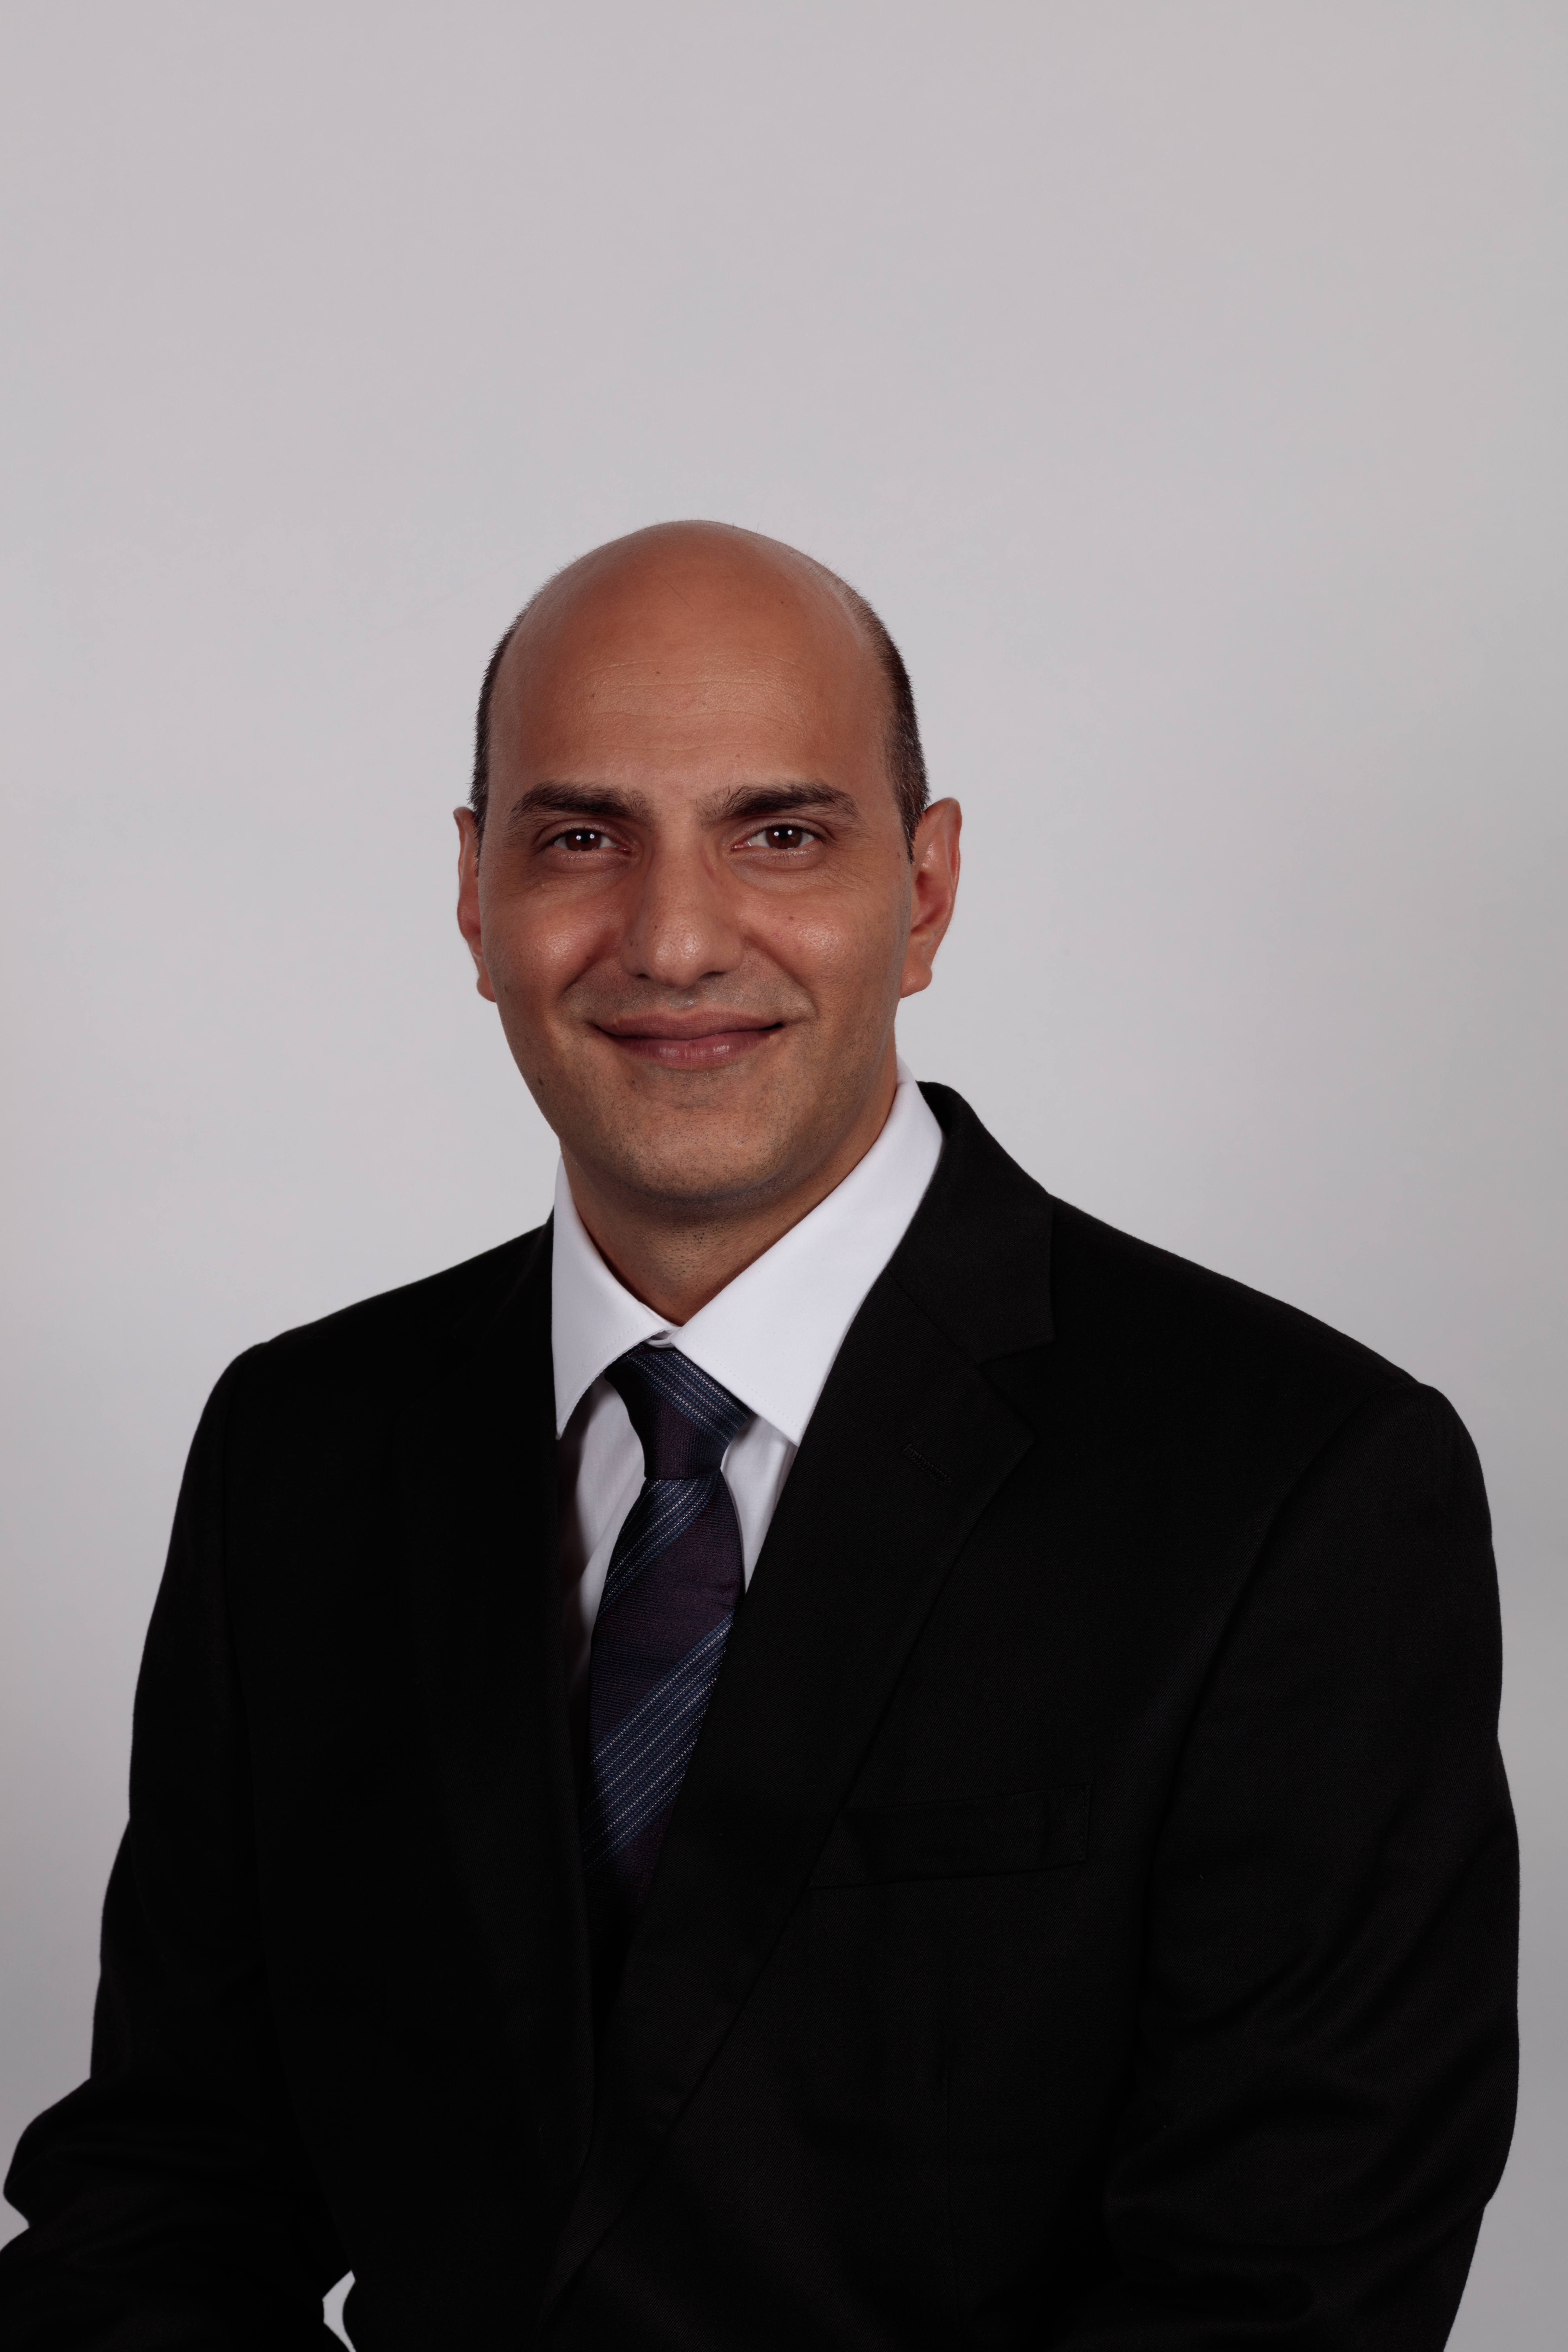 Mubarik Hussain